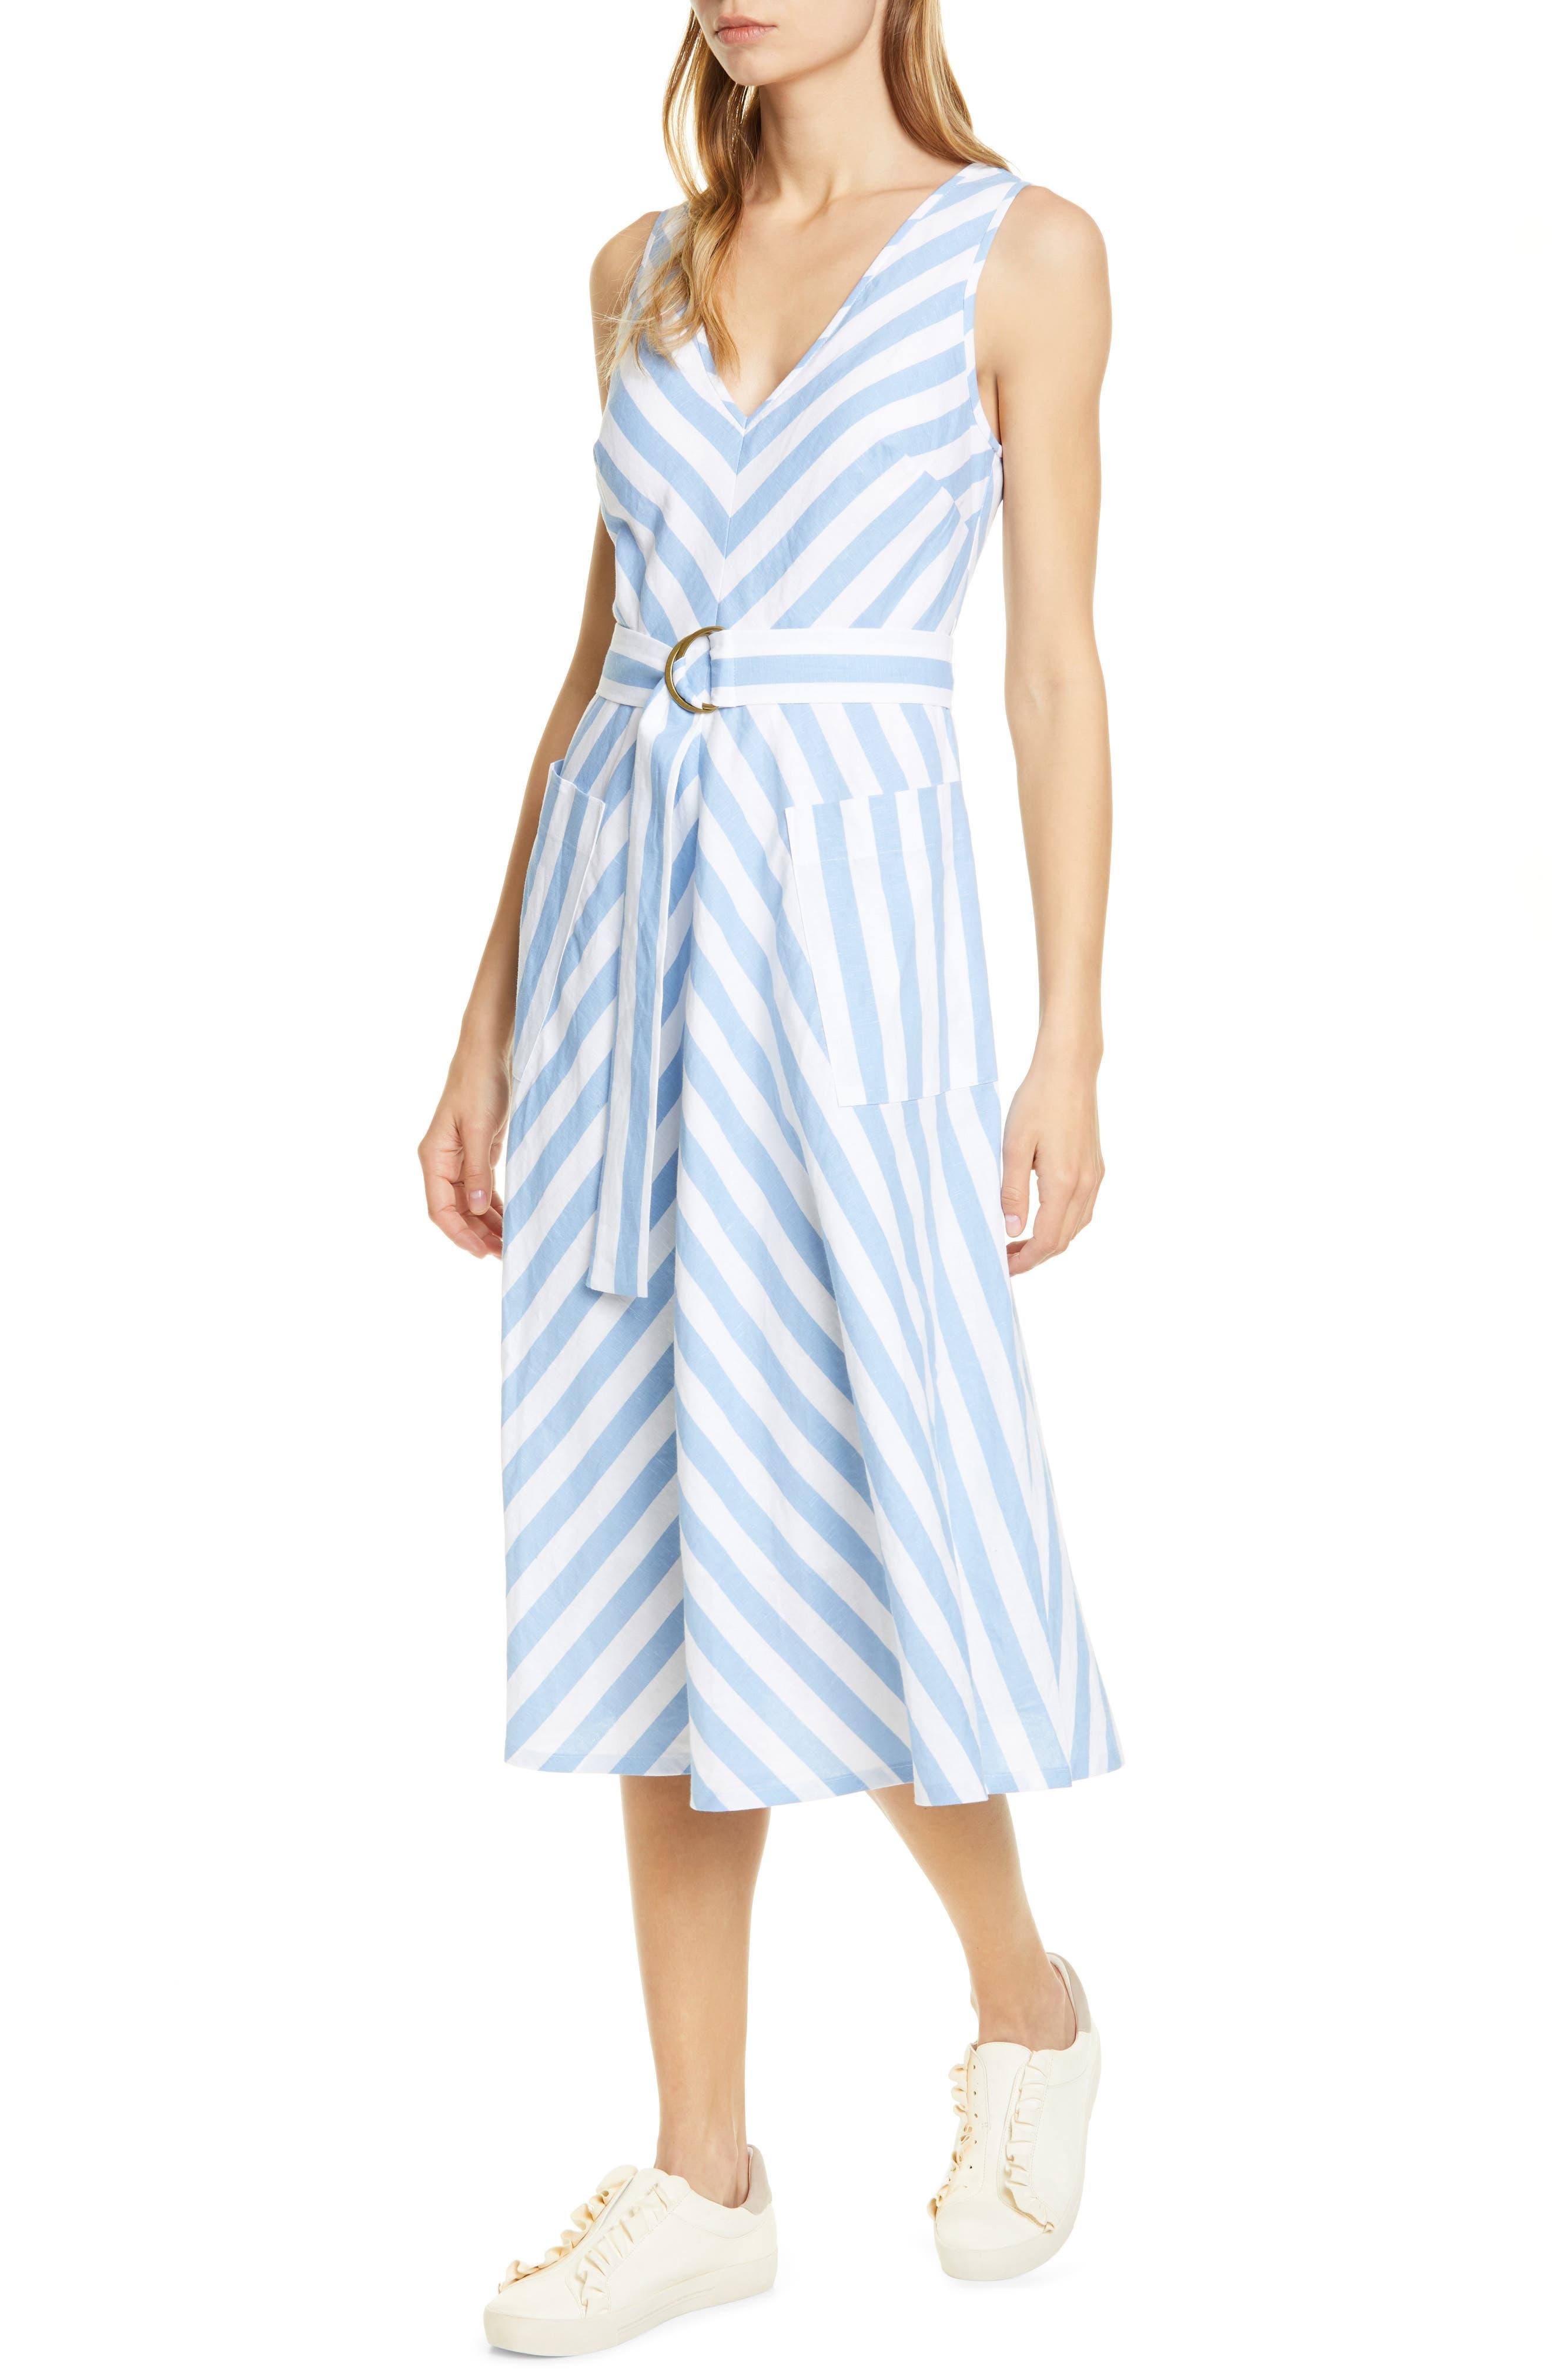 Kate Spade New York Deck Stripe Midi Dress, Blue